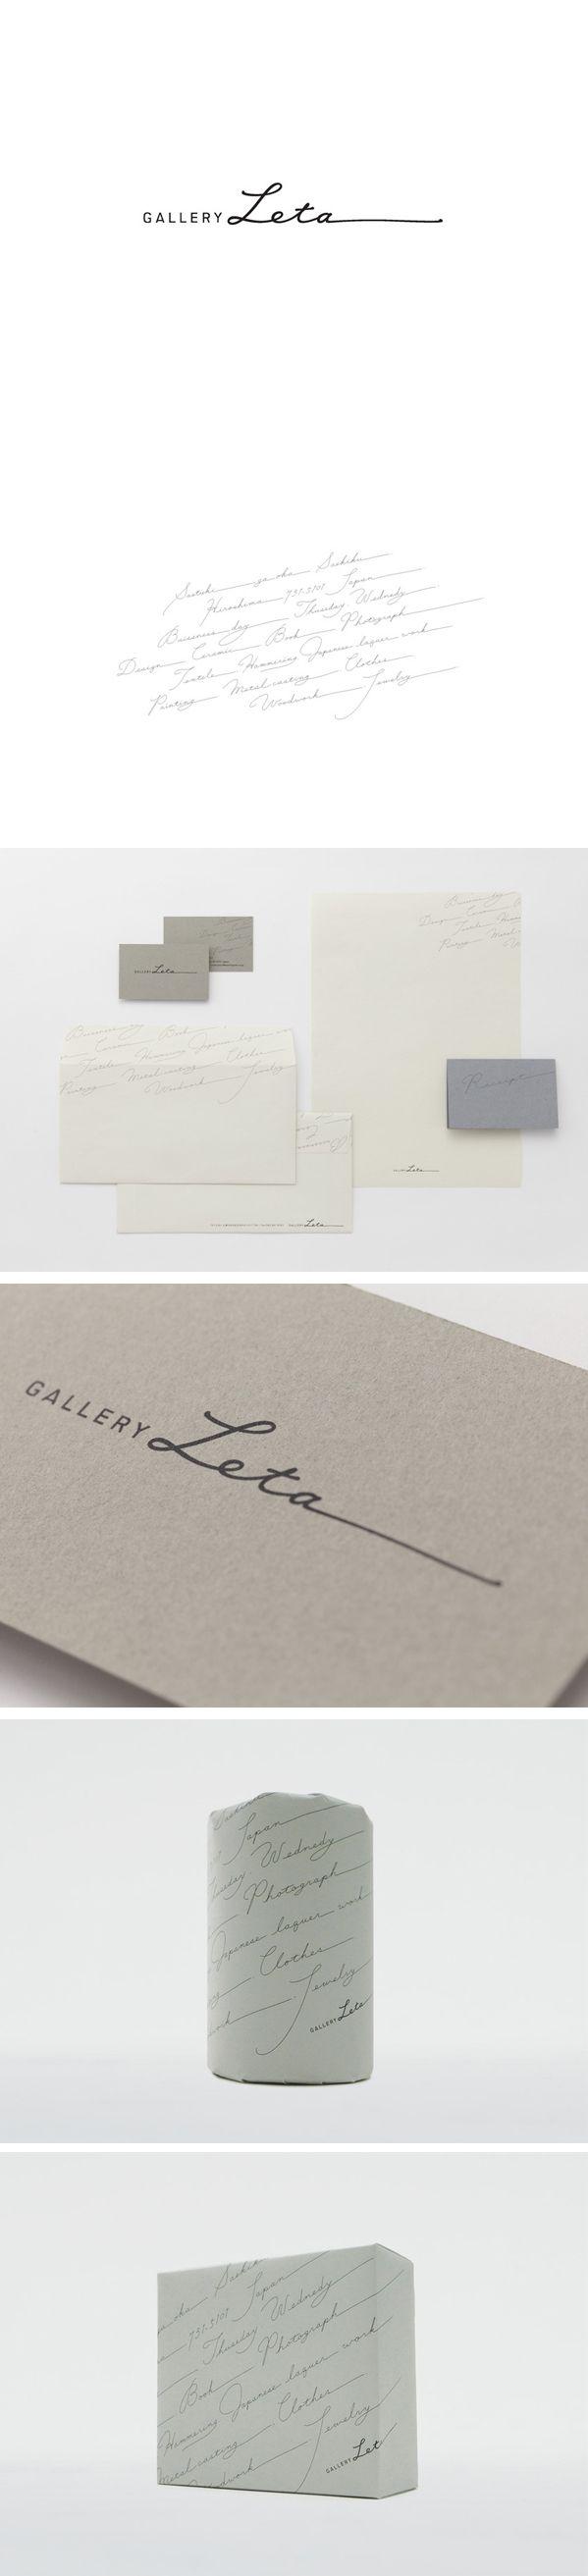 GALLERY LETA - Daikoku Design Institute / design / logo / branding / stationery /business card / signature and type - beautiful, elegant and classy design